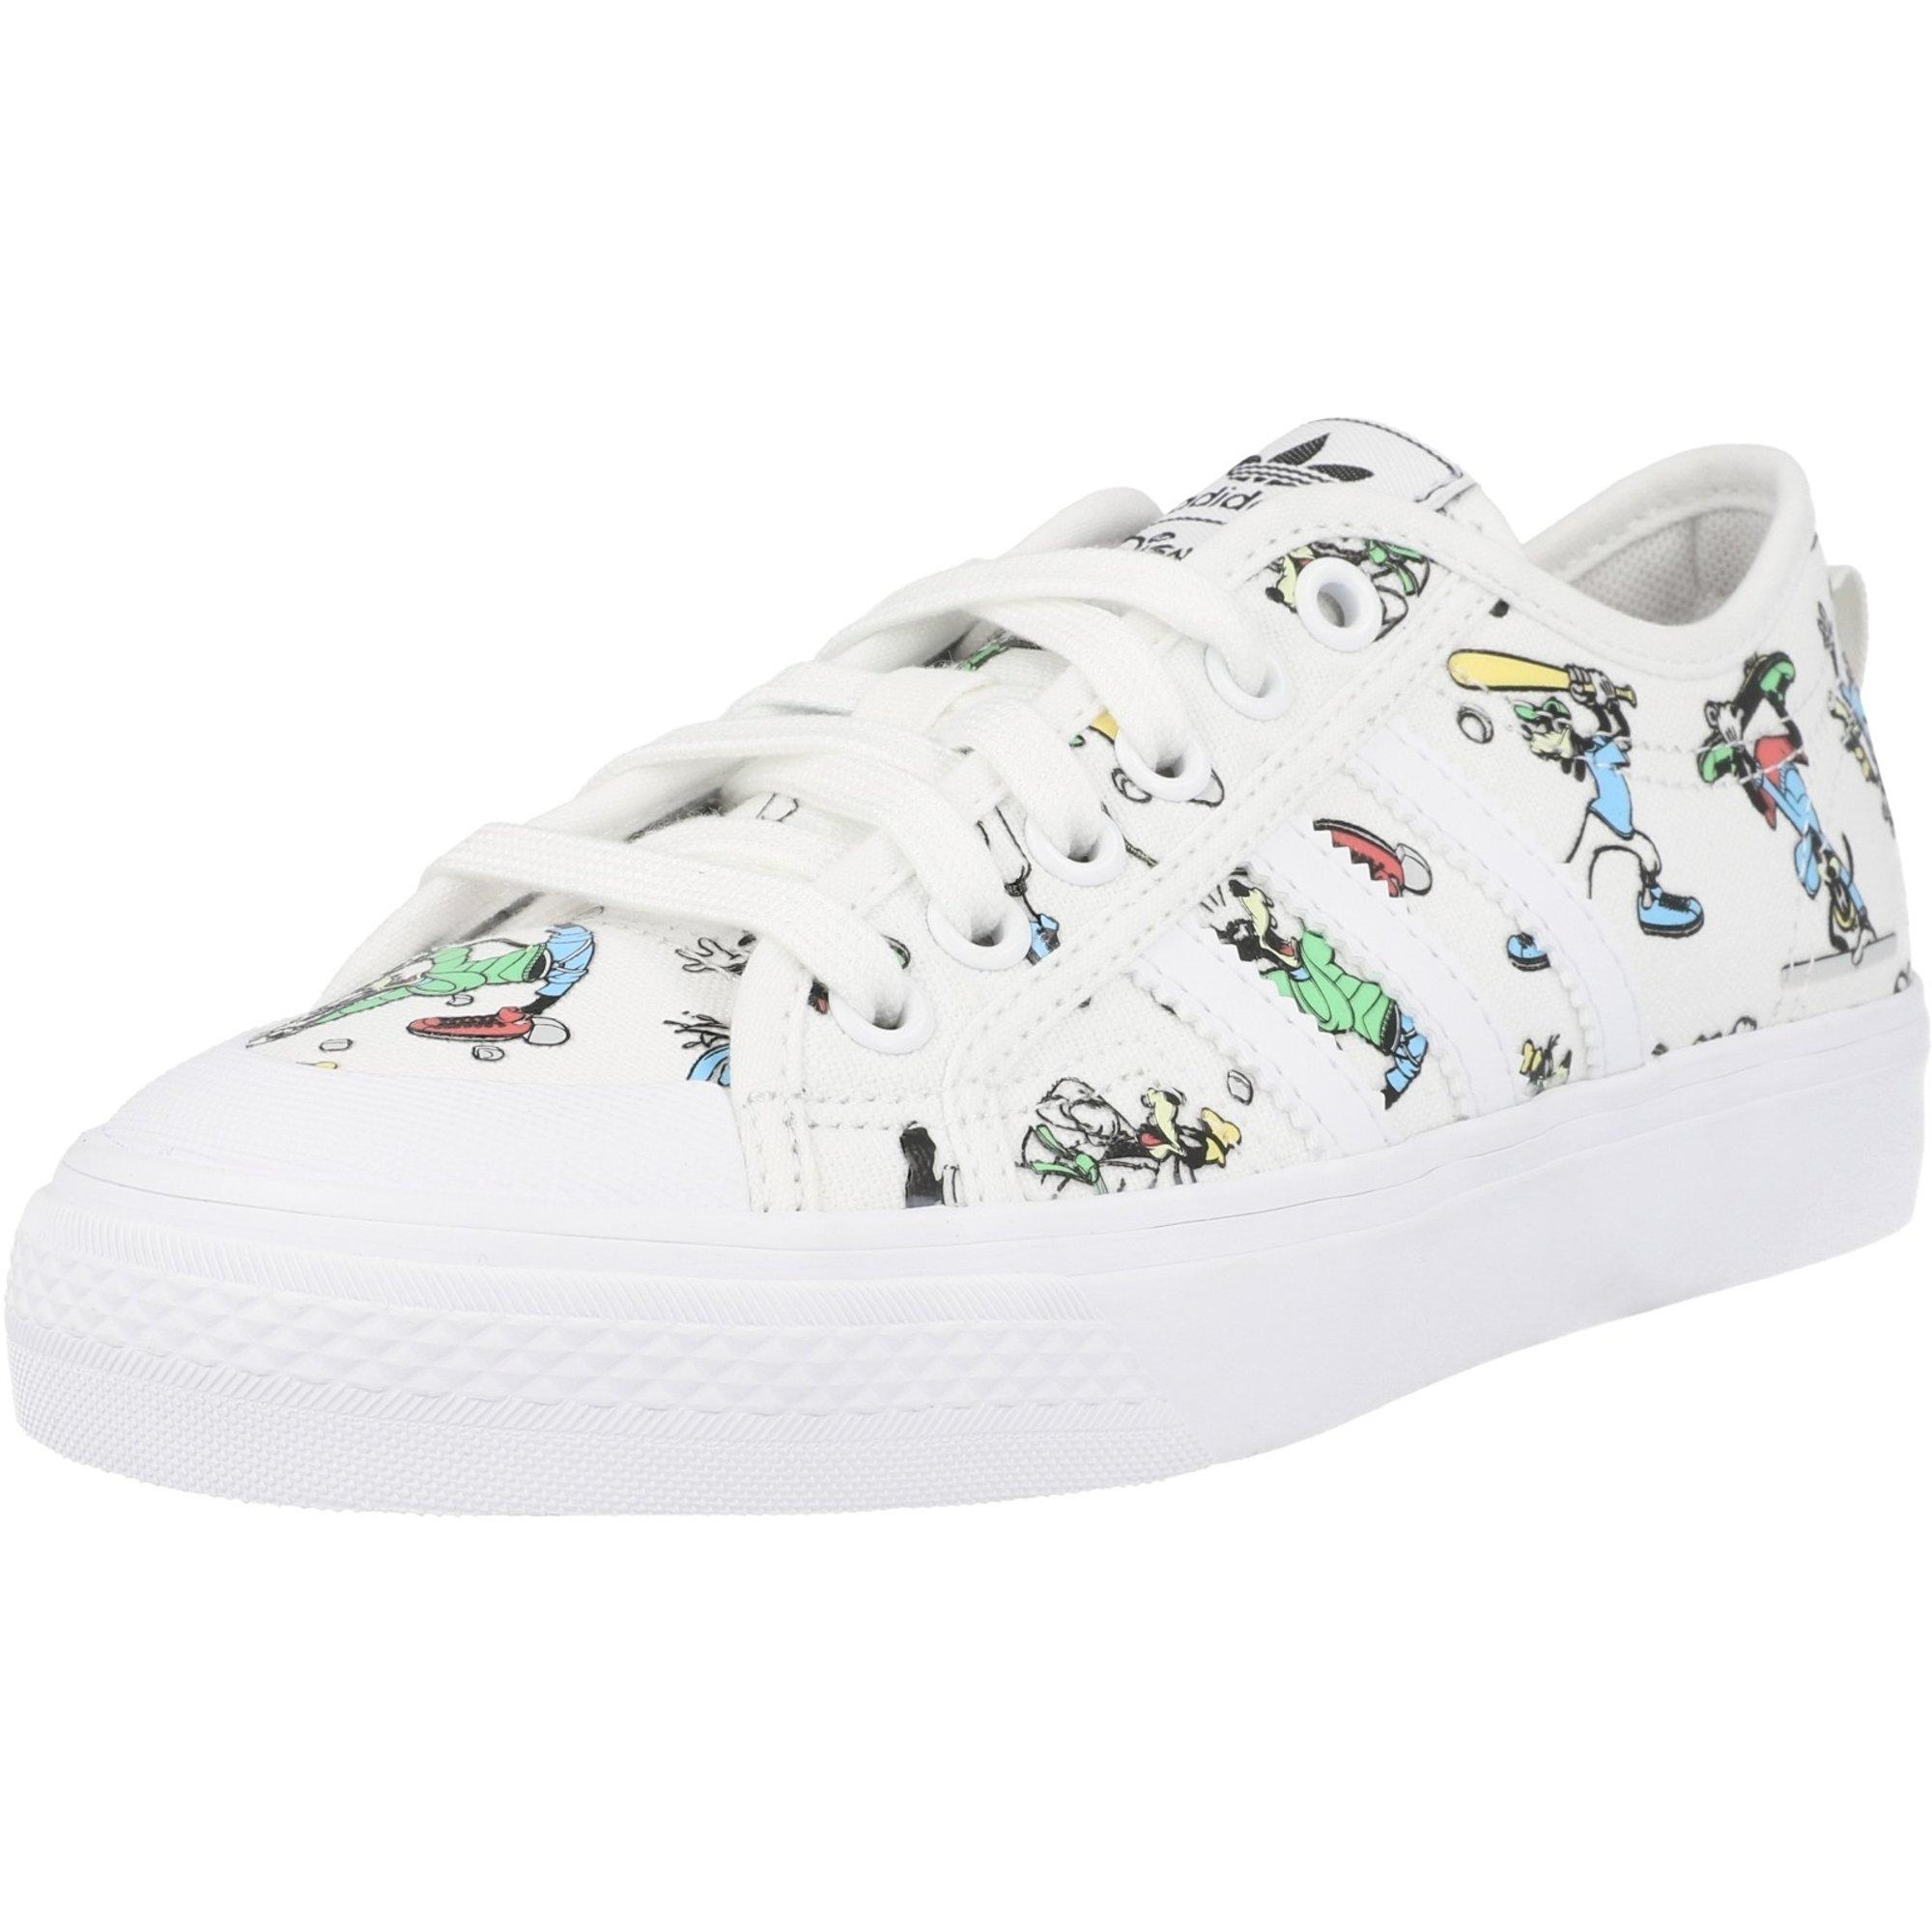 adidas Originals Nizza X Disney J White